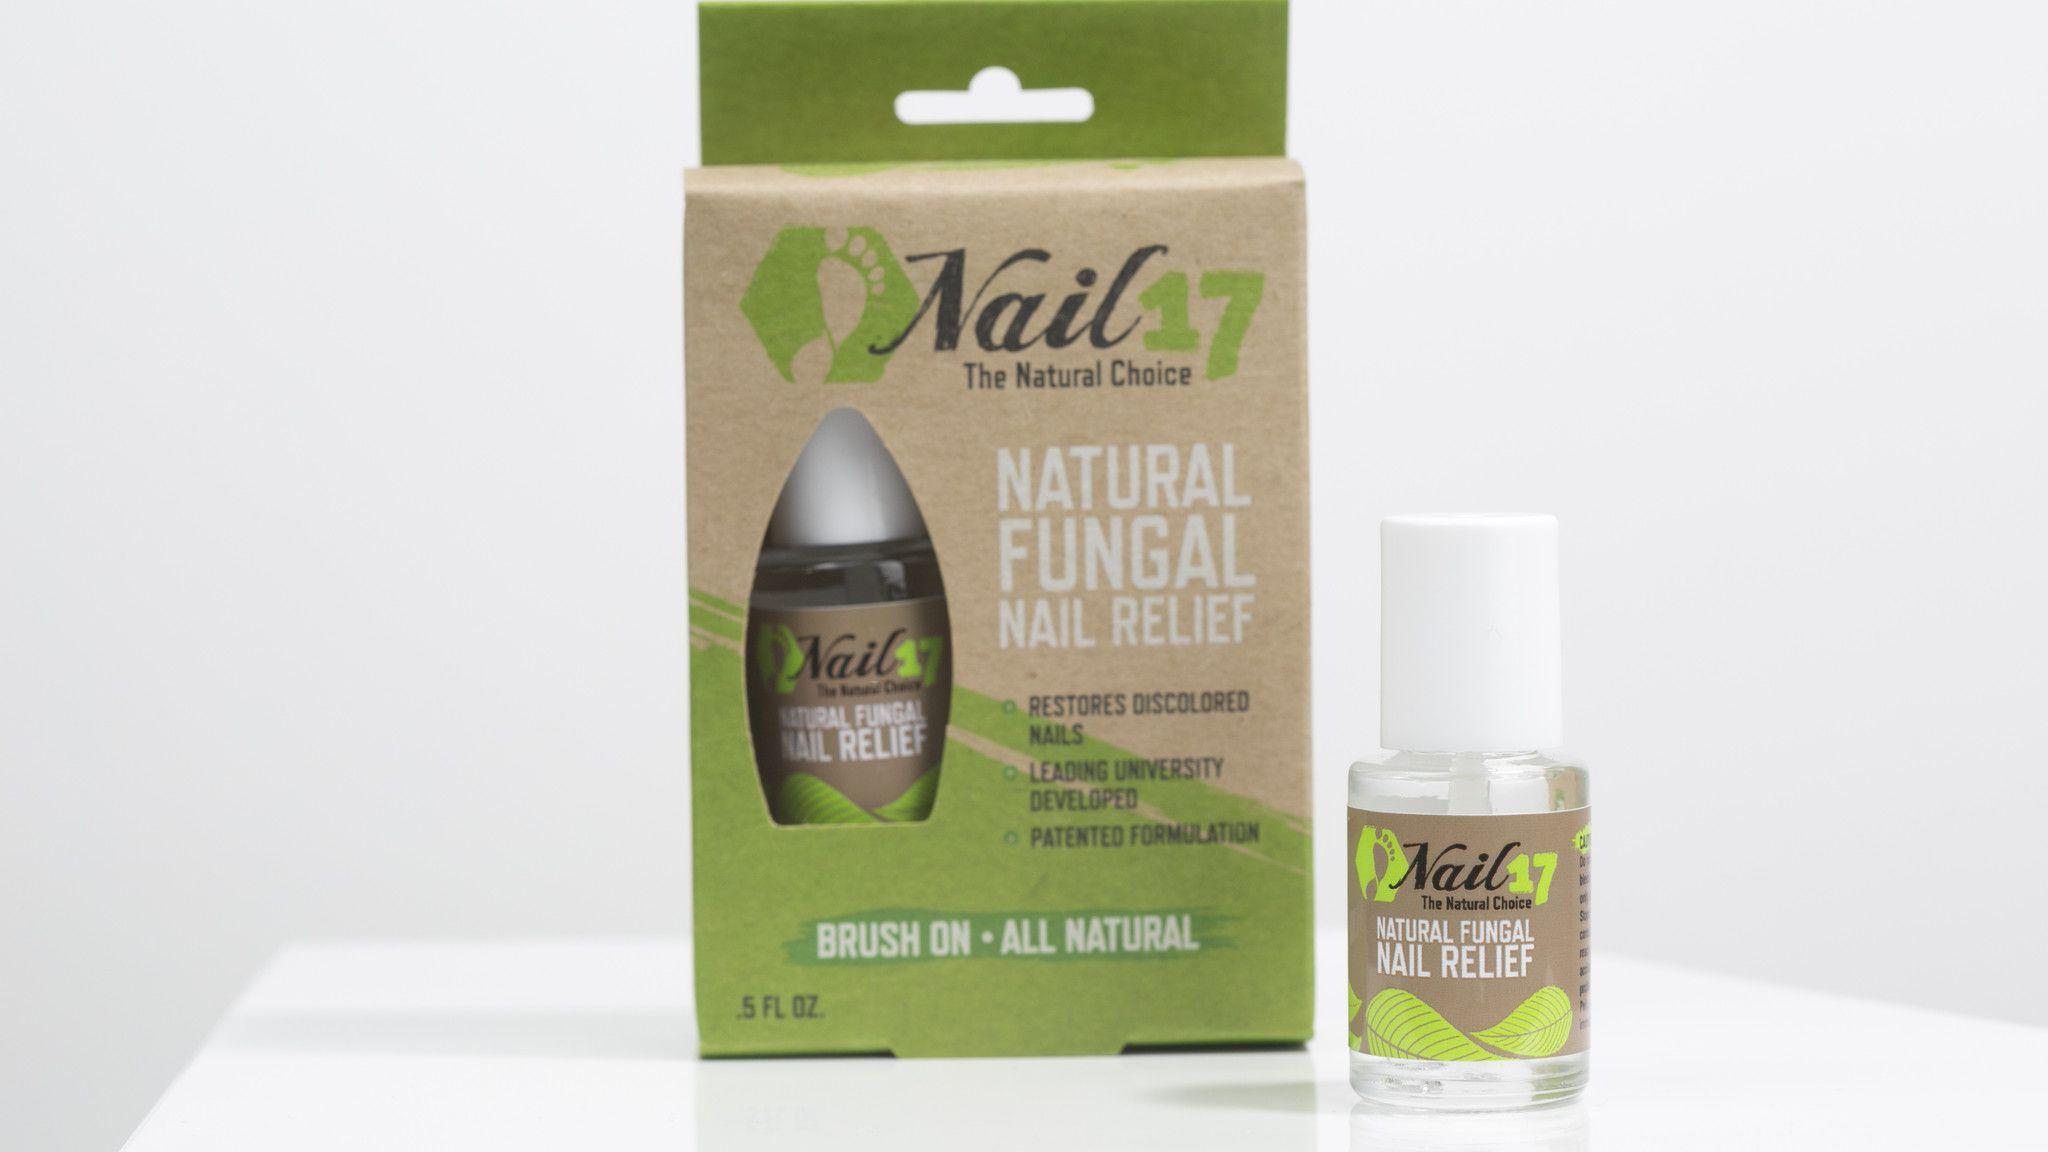 Nail17 Natural Fungal Nail Relief | Remedies | Pinterest | Fungal ...